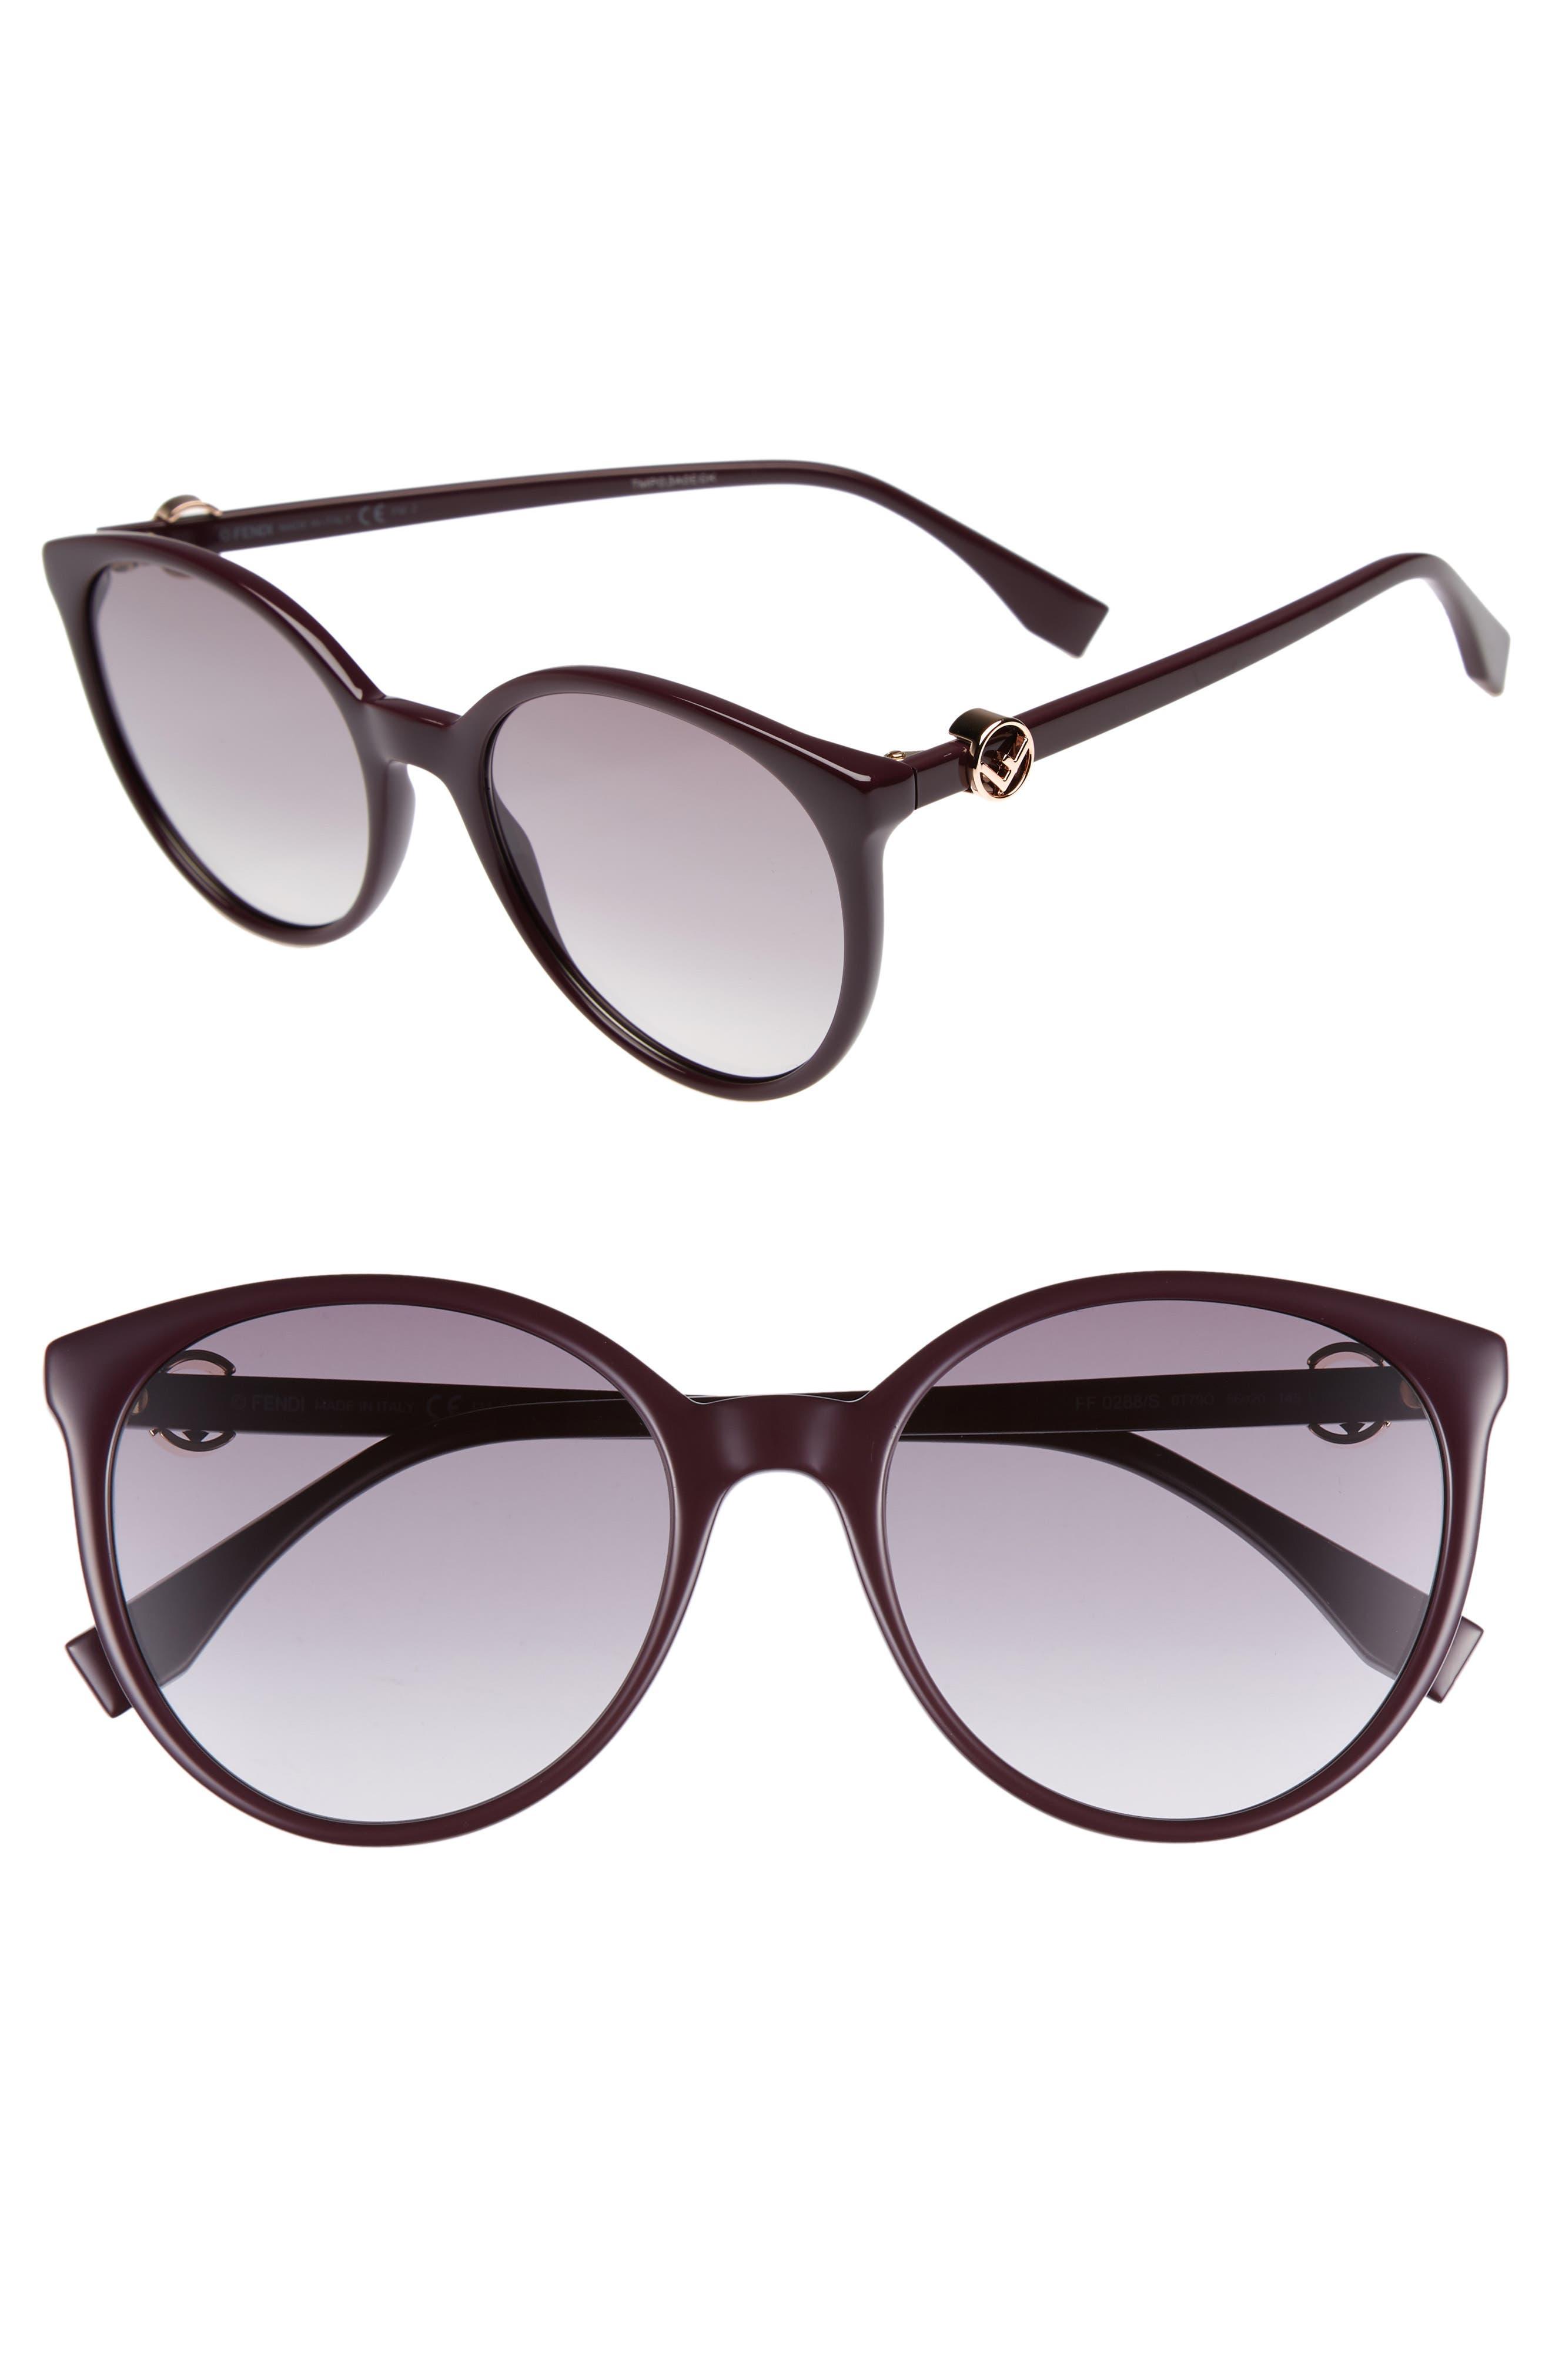 Fendi 56mm Retro Sunglasses